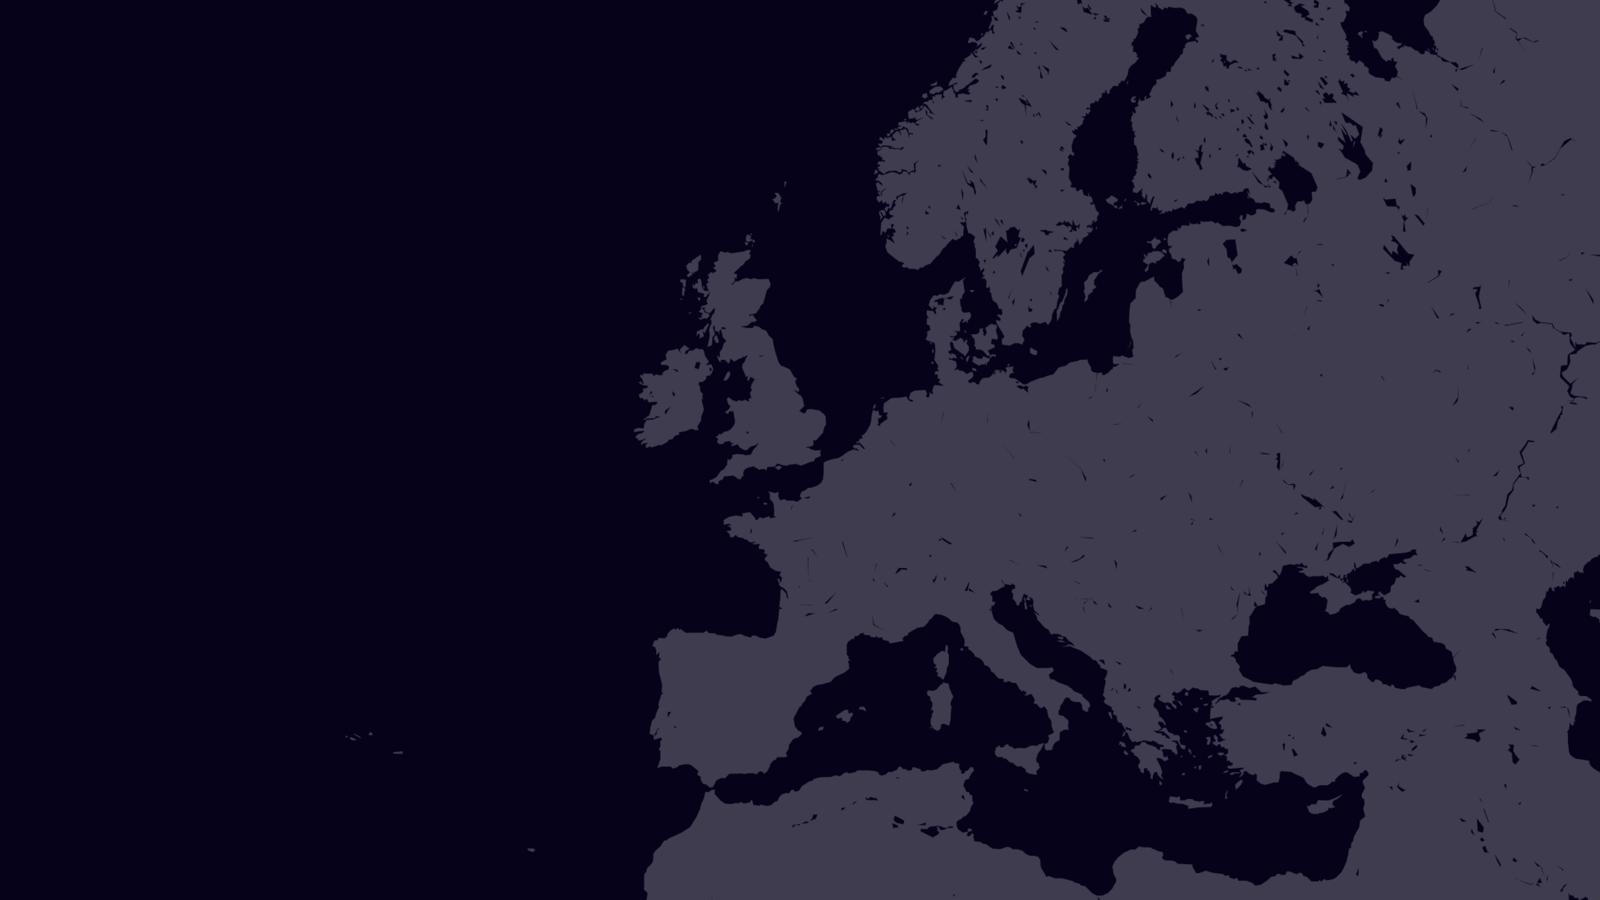 Omonia Office Locations - Europe